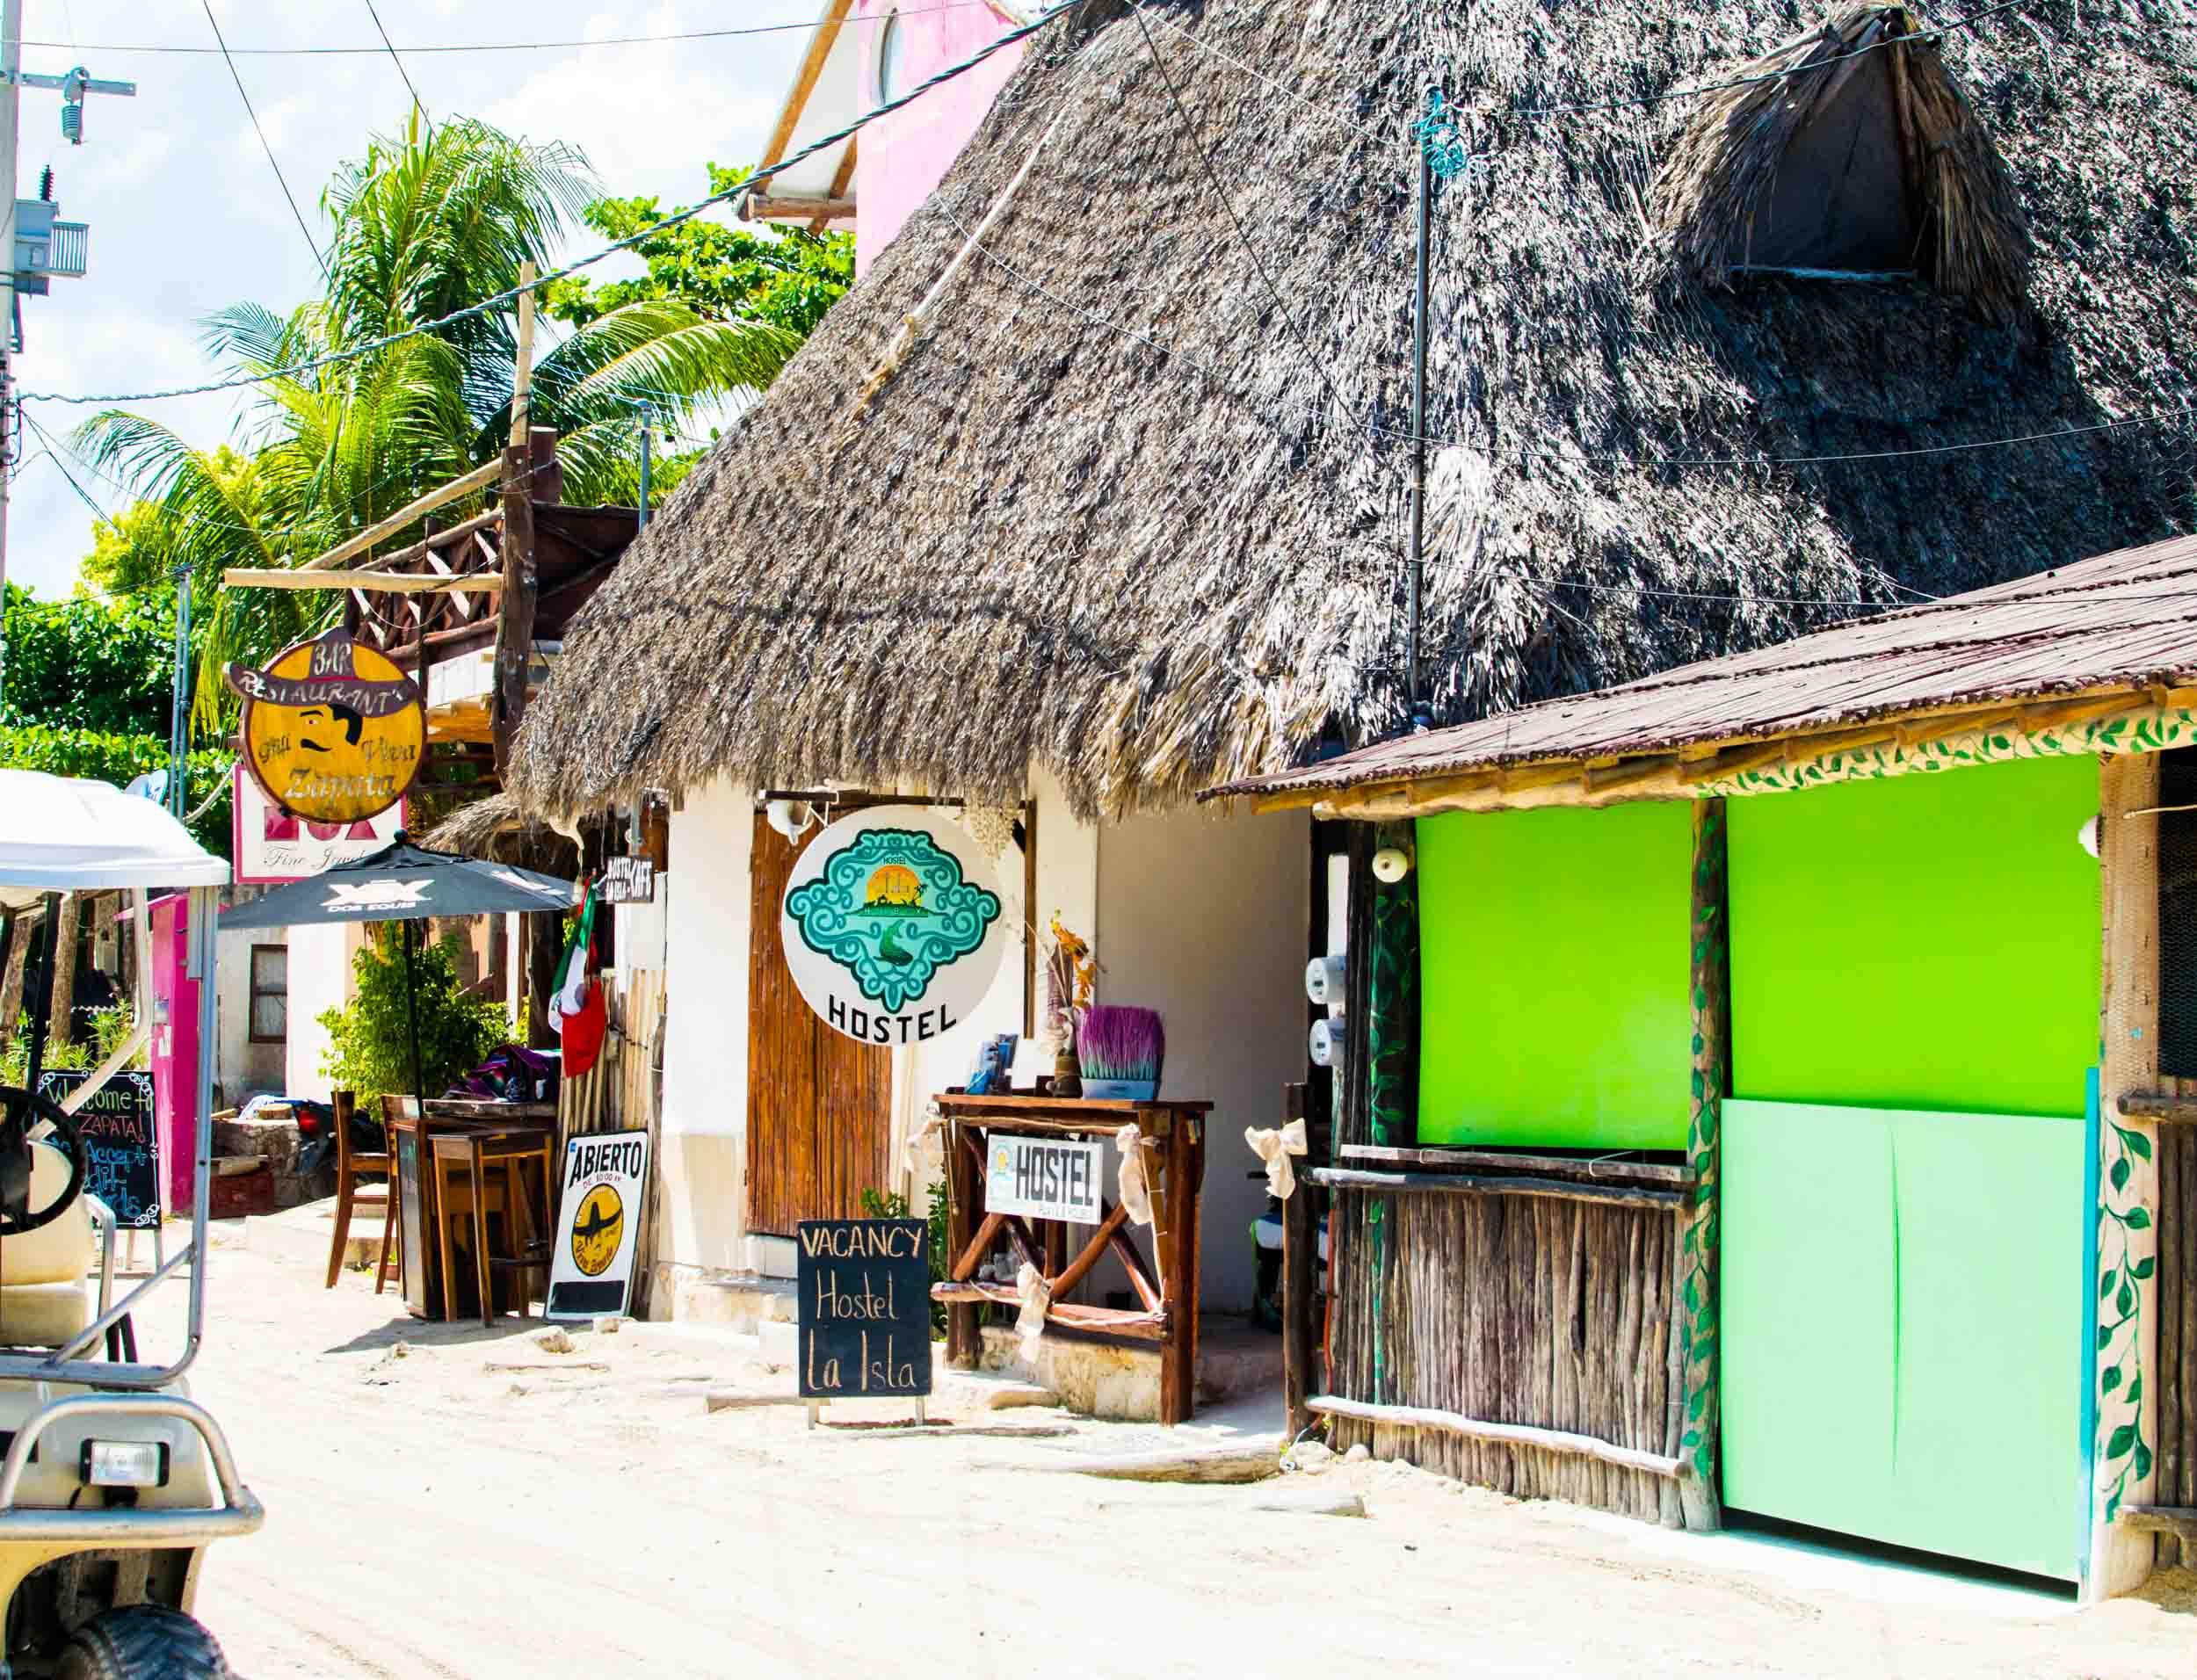 Hostel La Isla Holbox on Holbox Island, Mexico.